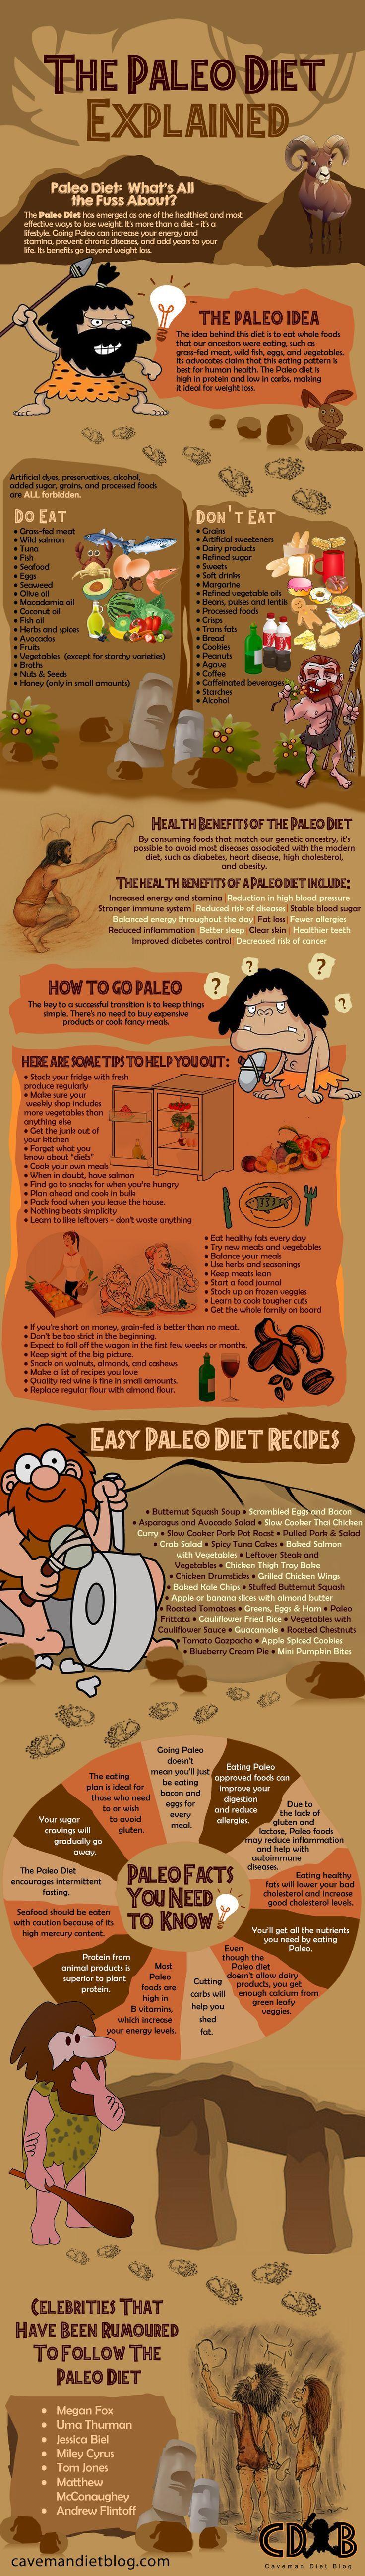 Paleolithic diet plan food list photo 8